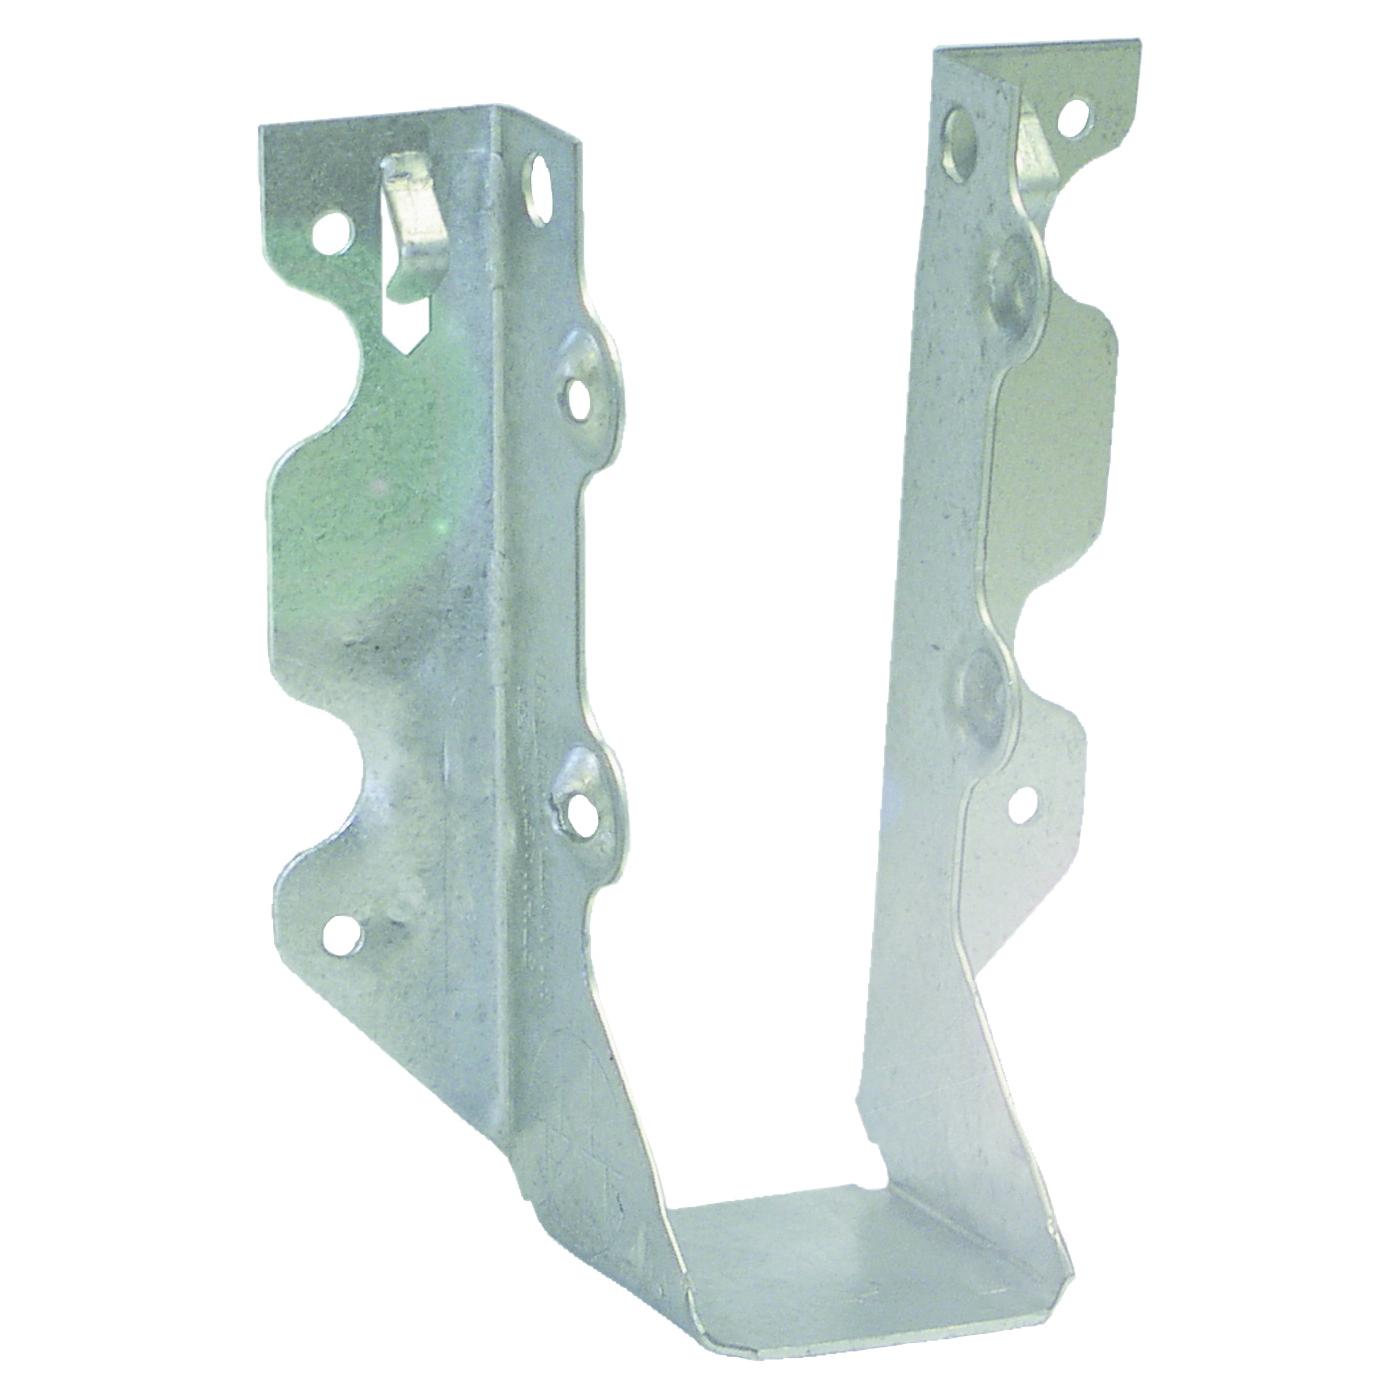 Picture of MiTek JUS26-TZ Slant Joist Hanger, 4-13/16 in H, 1-3/4 in D, 1-9/16 in W, 2 in x 6 to 8 in, Steel, Zinc